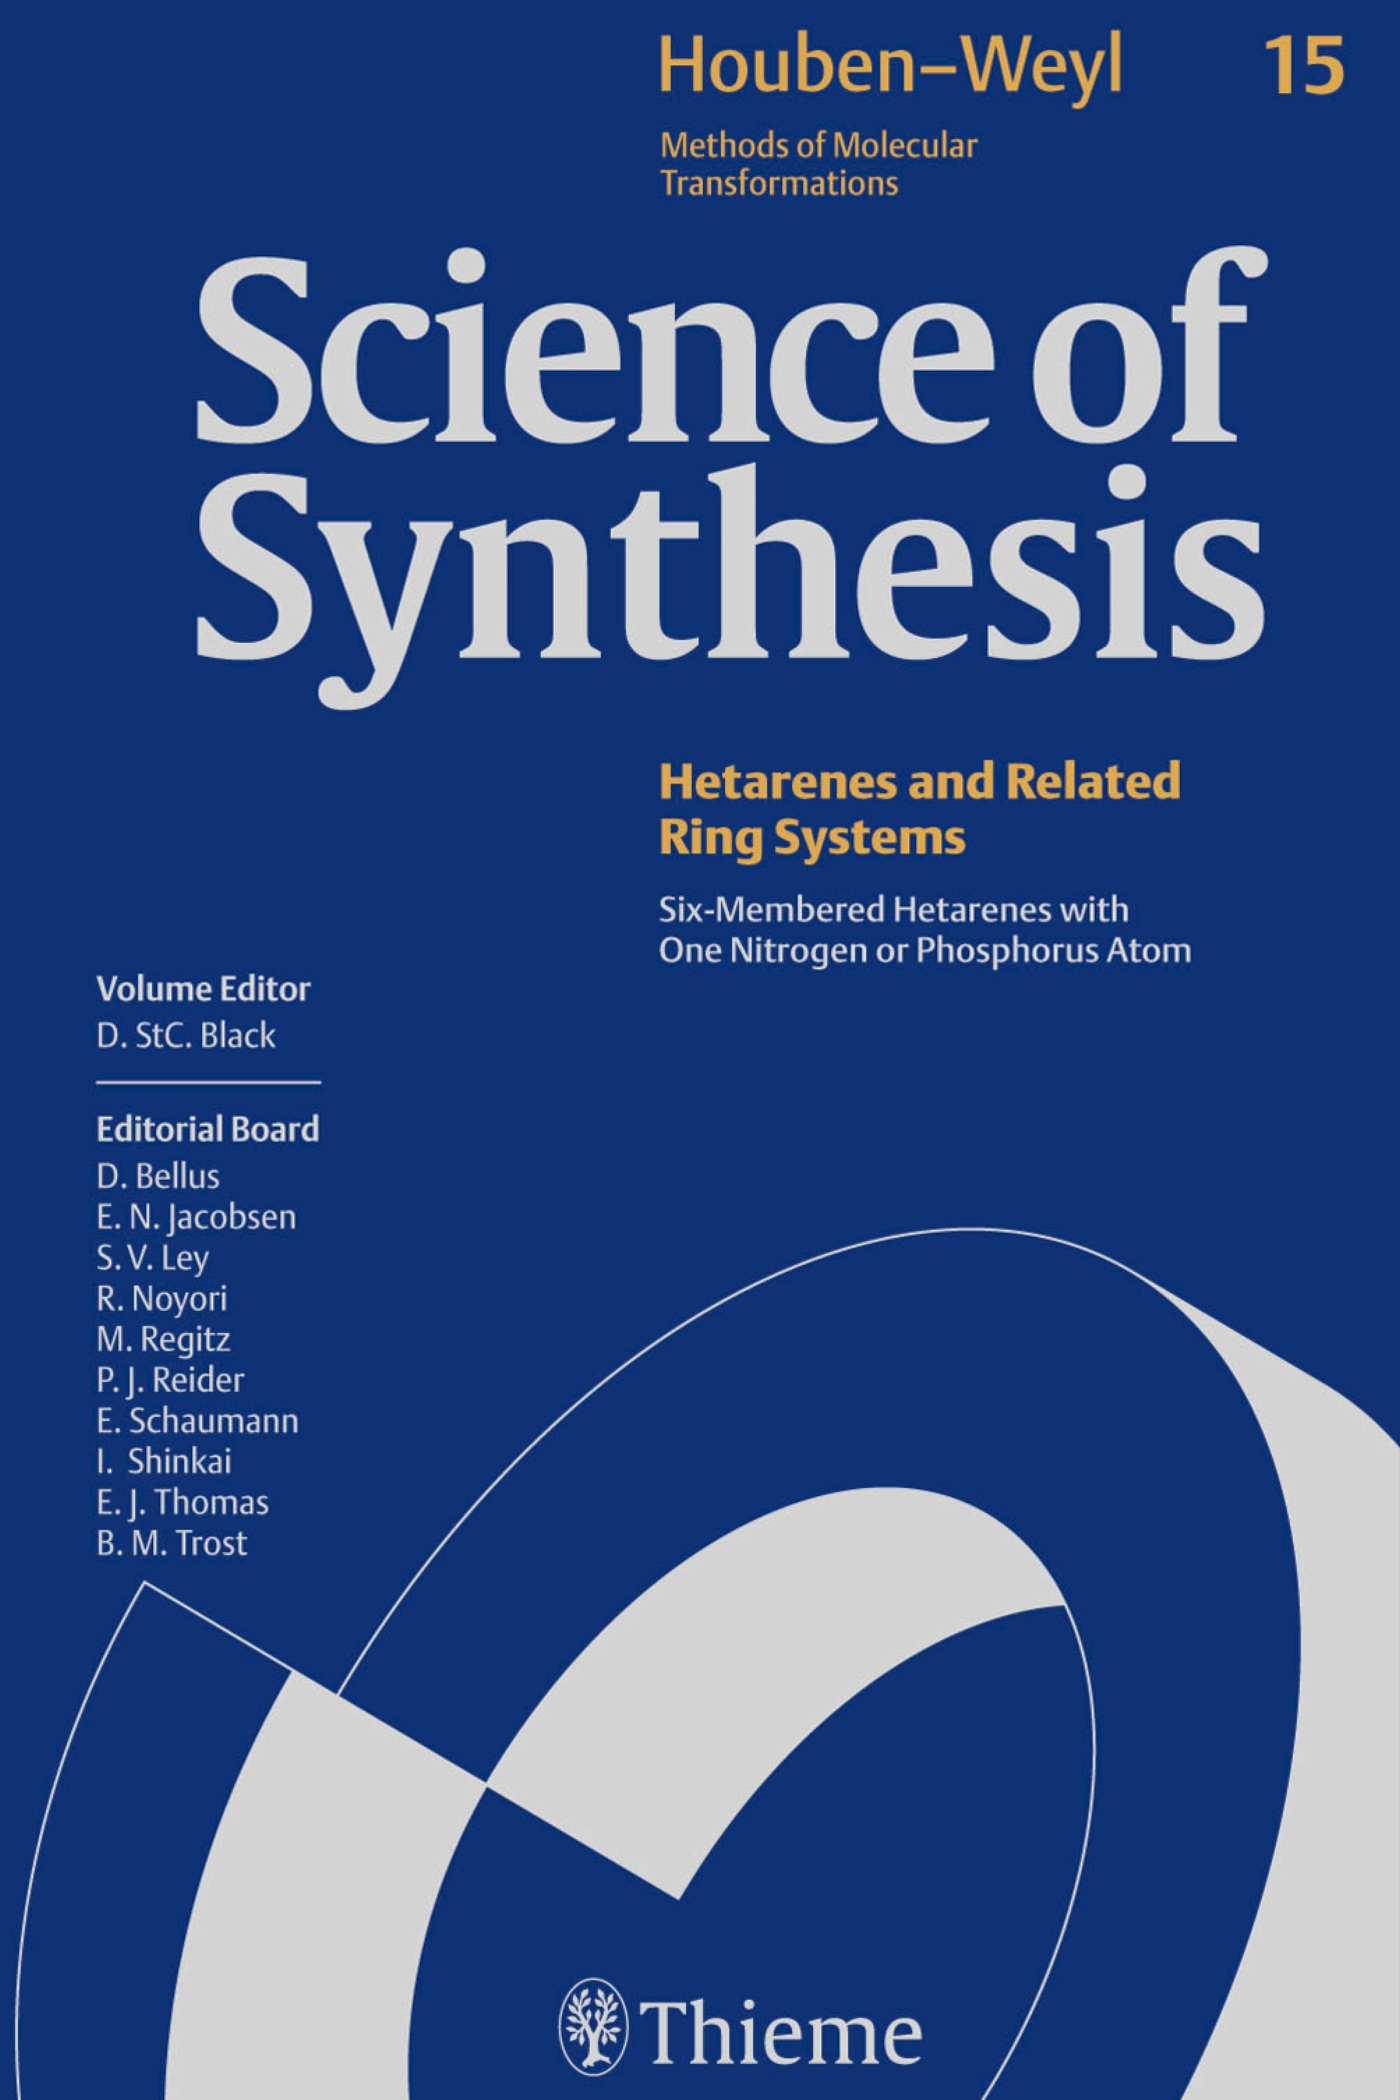 Science of Synthesis: Houben-Weyl Methods of Molecular Transformations  Vol. 15